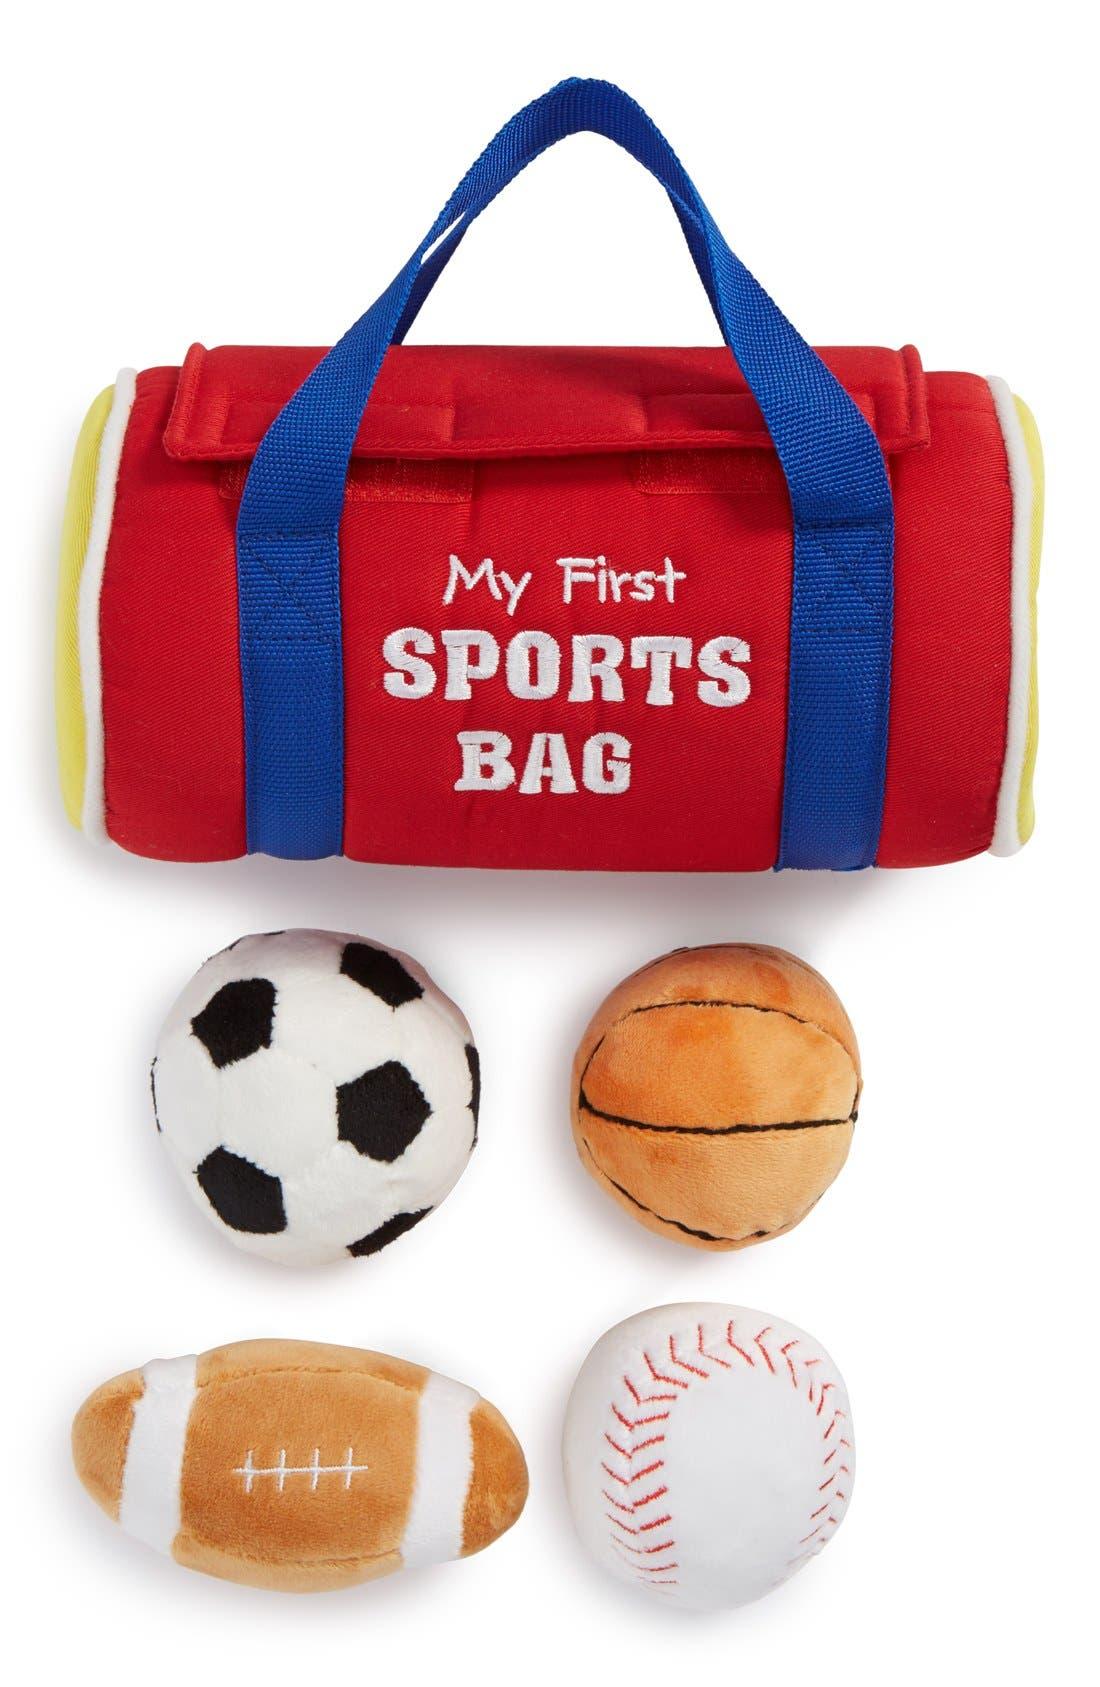 Main Image - Baby Gund 'My First Sports Bag' Play Set